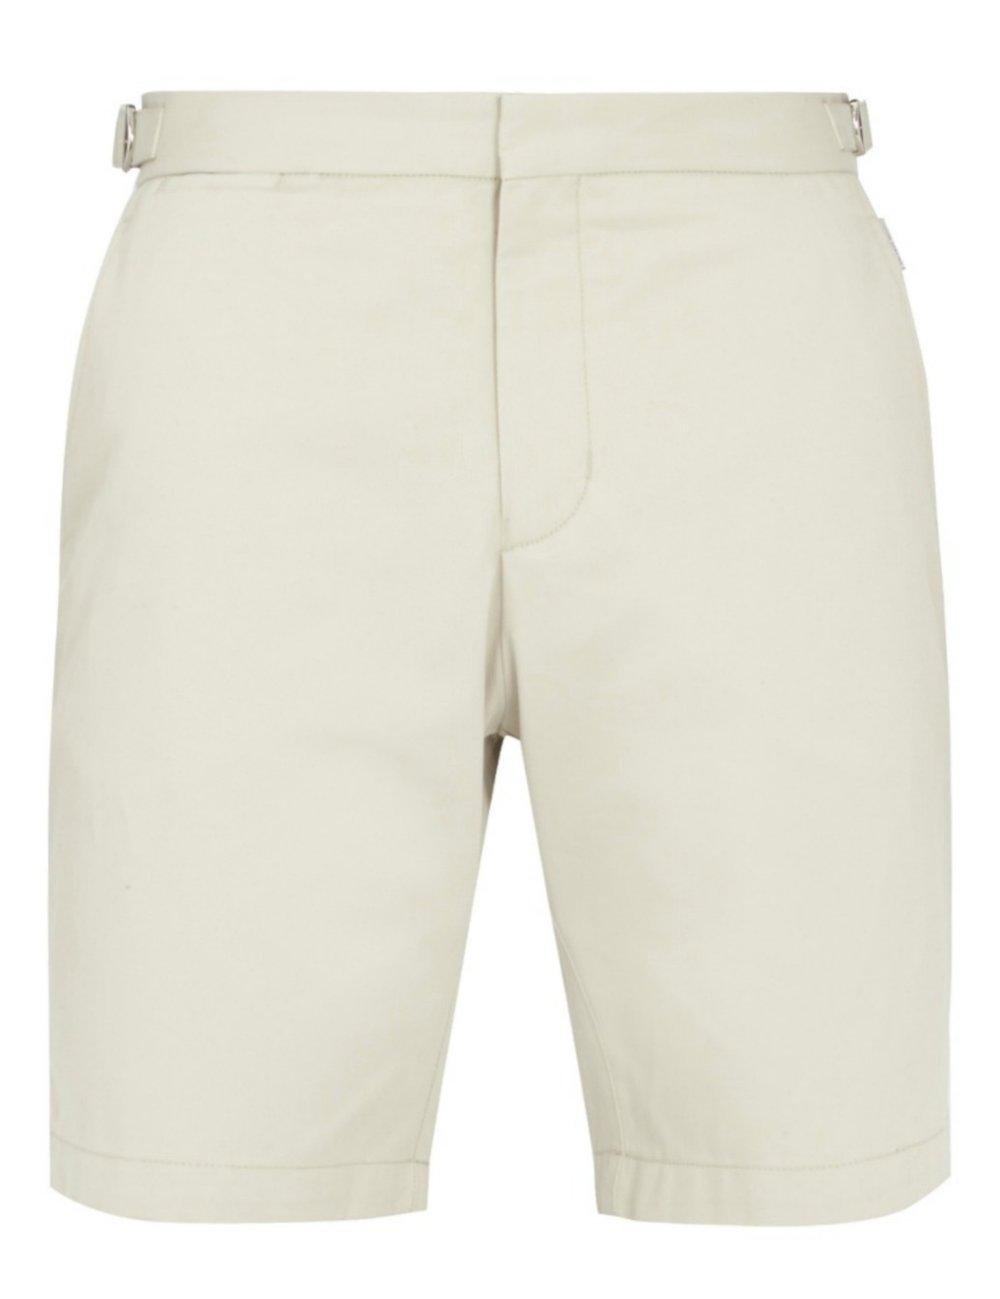 ORLEBAR BROWNNorwich mid-length cotton shorts - MATCHESFASHION.COM